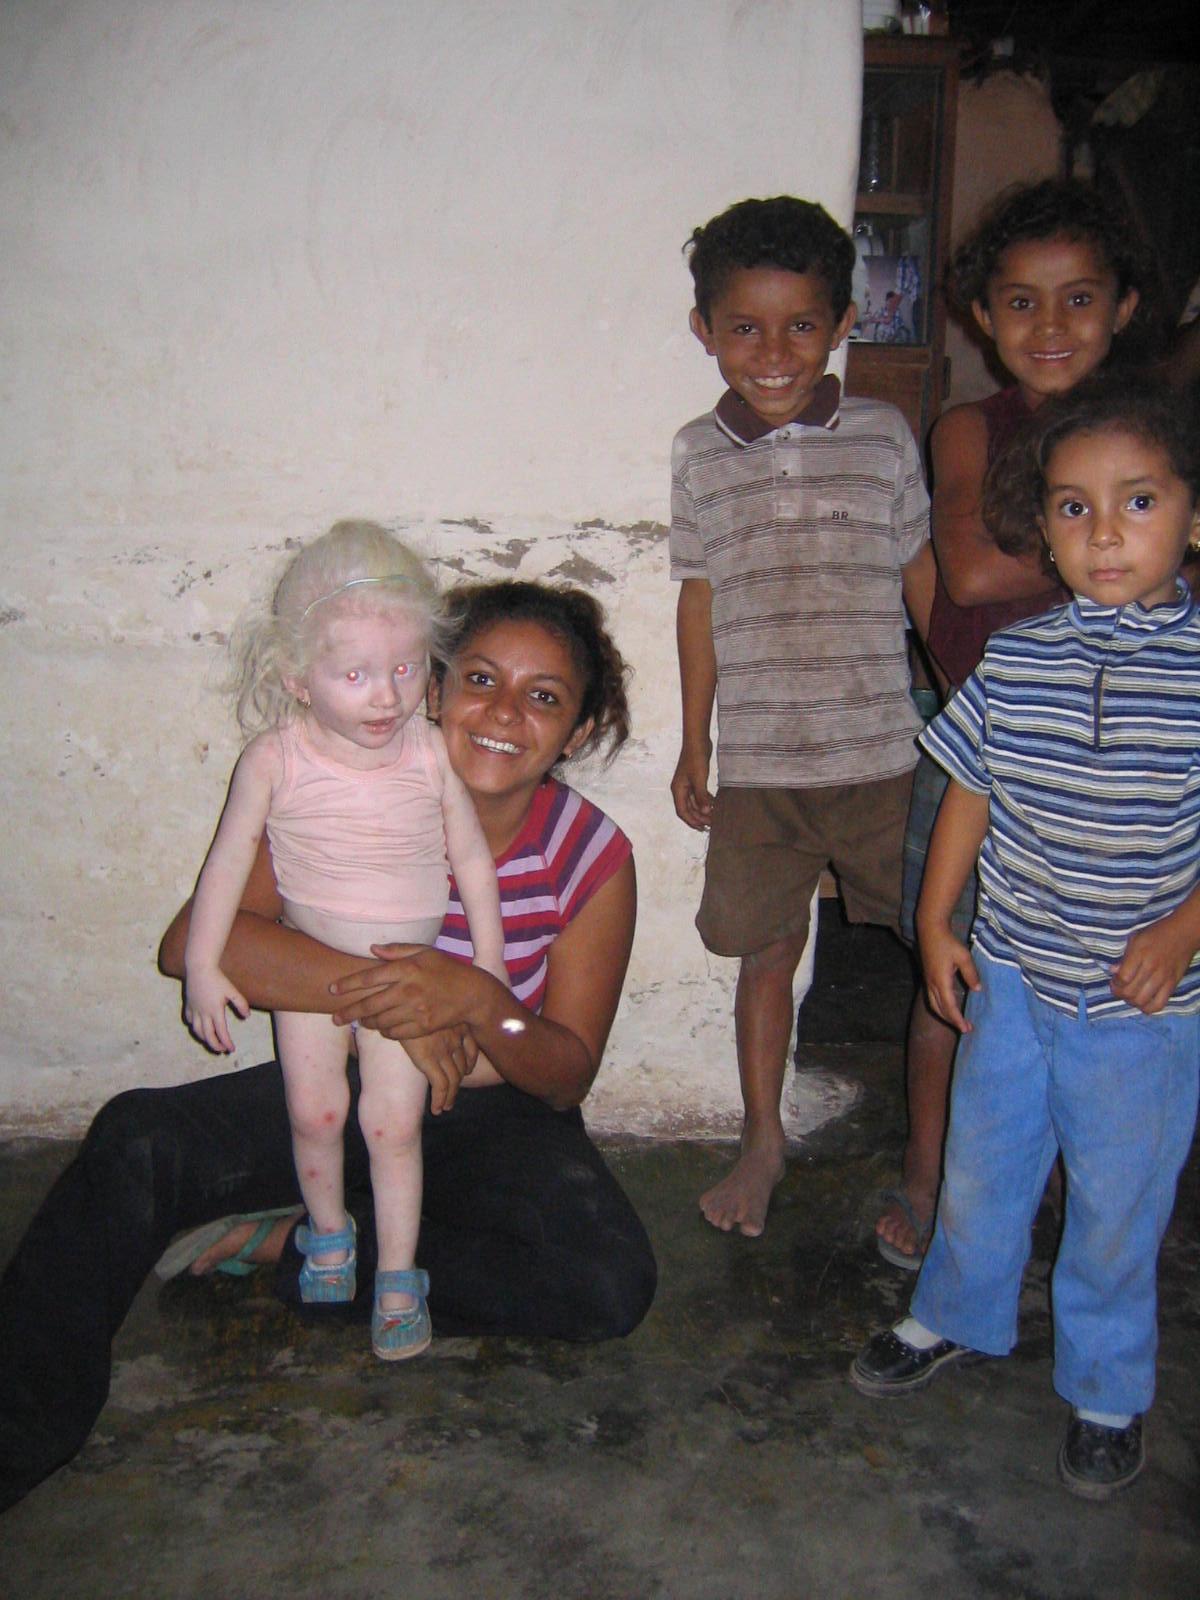 http://naturescrusaders.files.wordpress.com/2009/01/albino_girl_honduras2.jpg